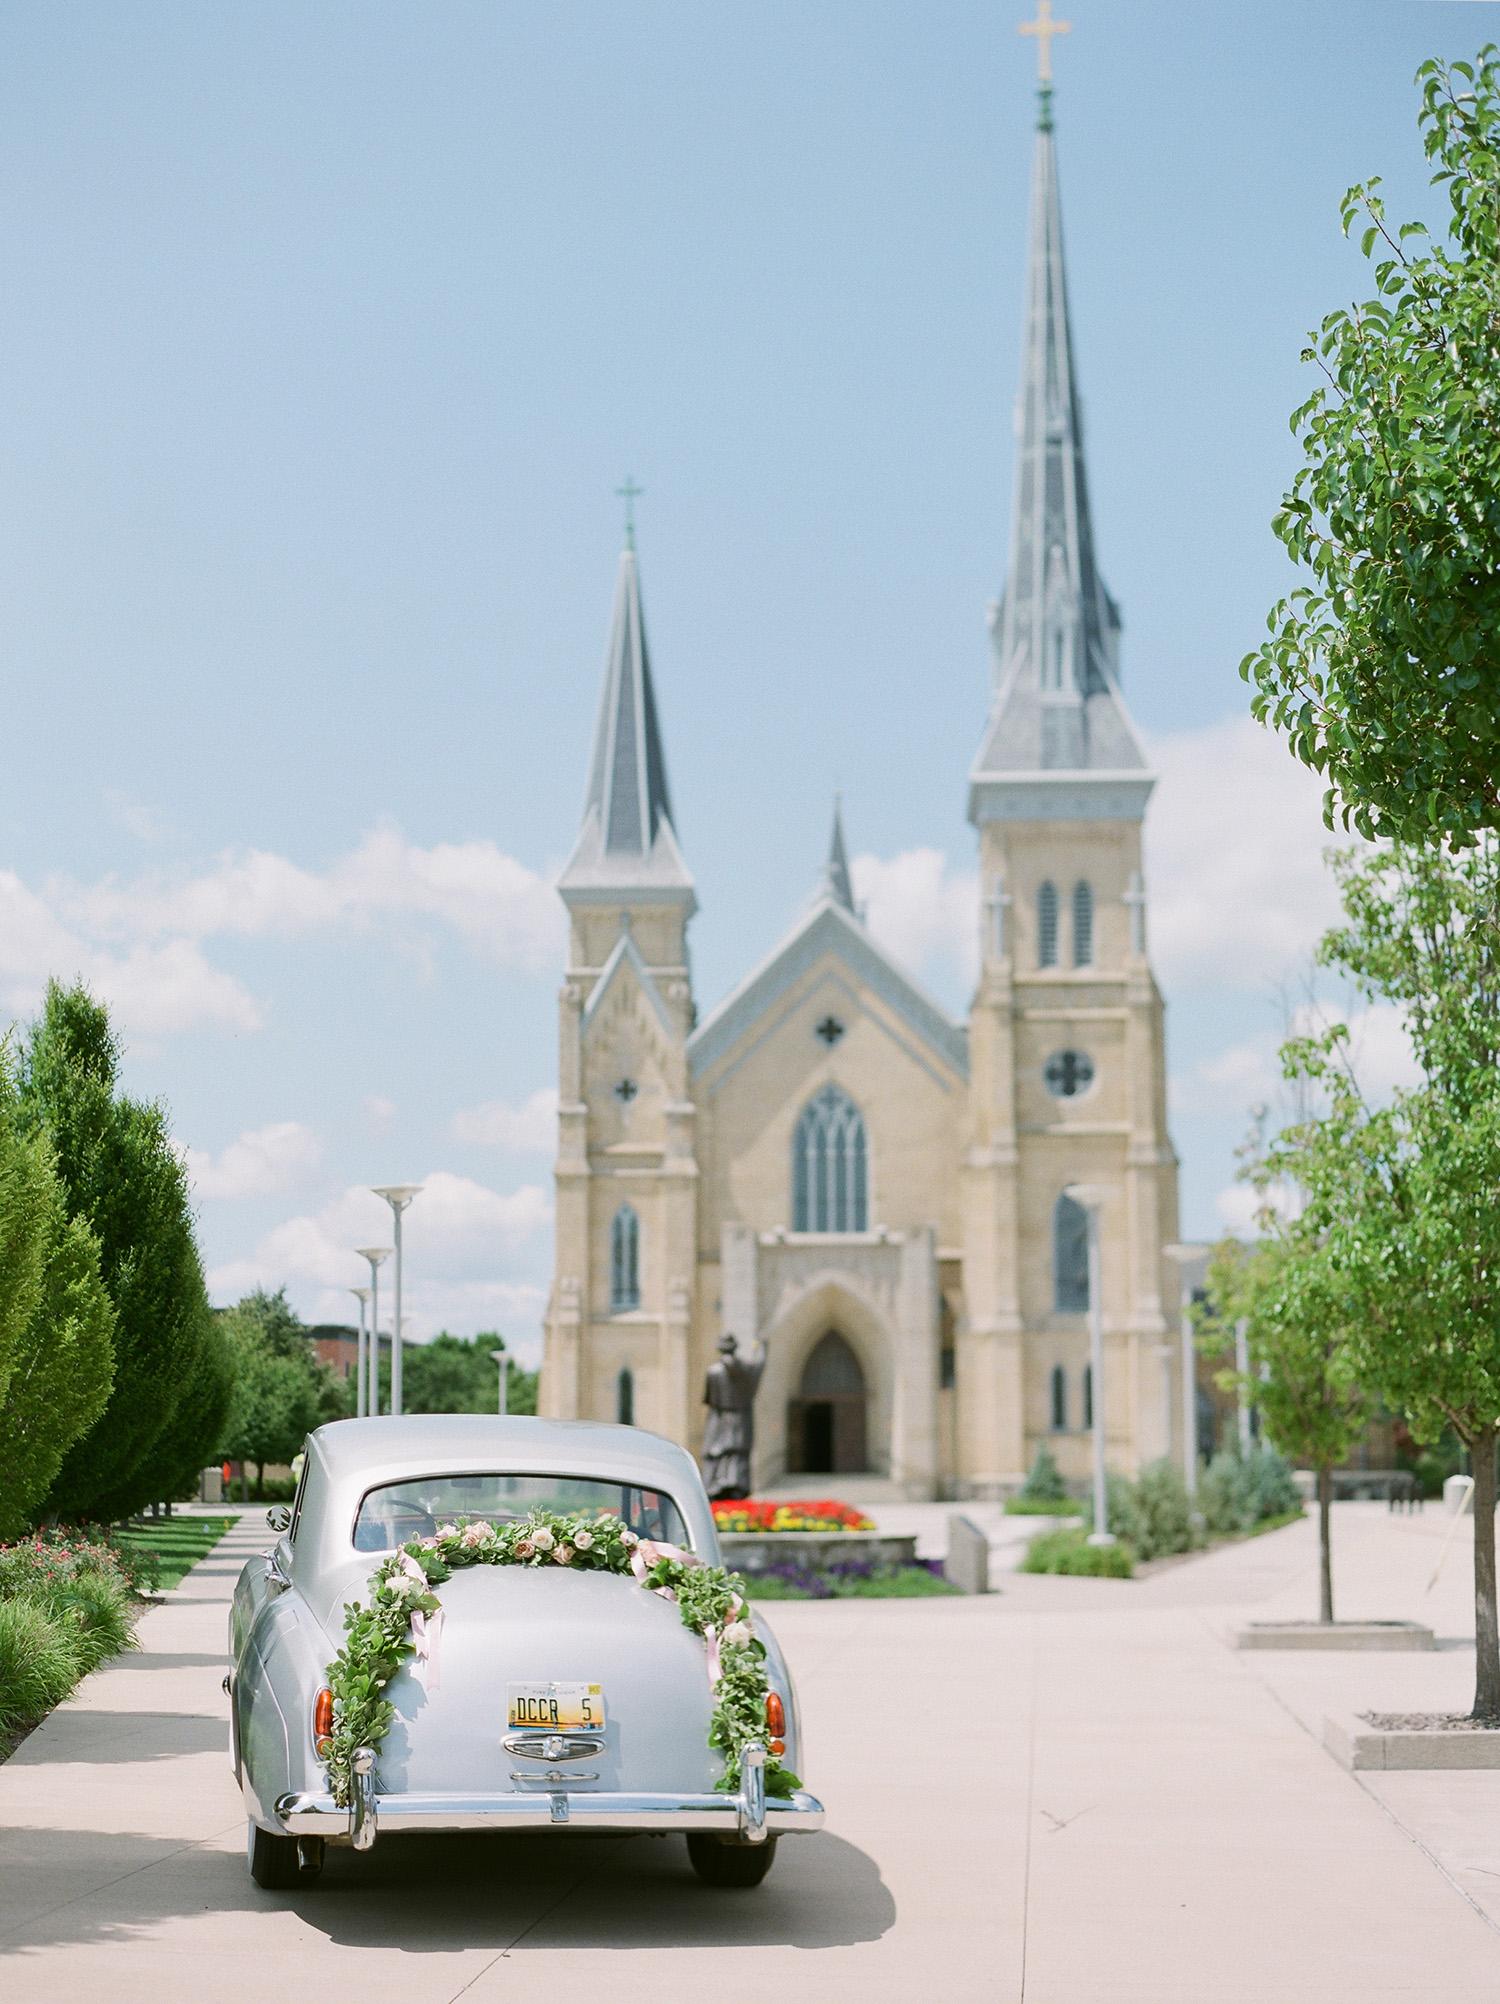 anwuli patrick wedding vintage car in front of church